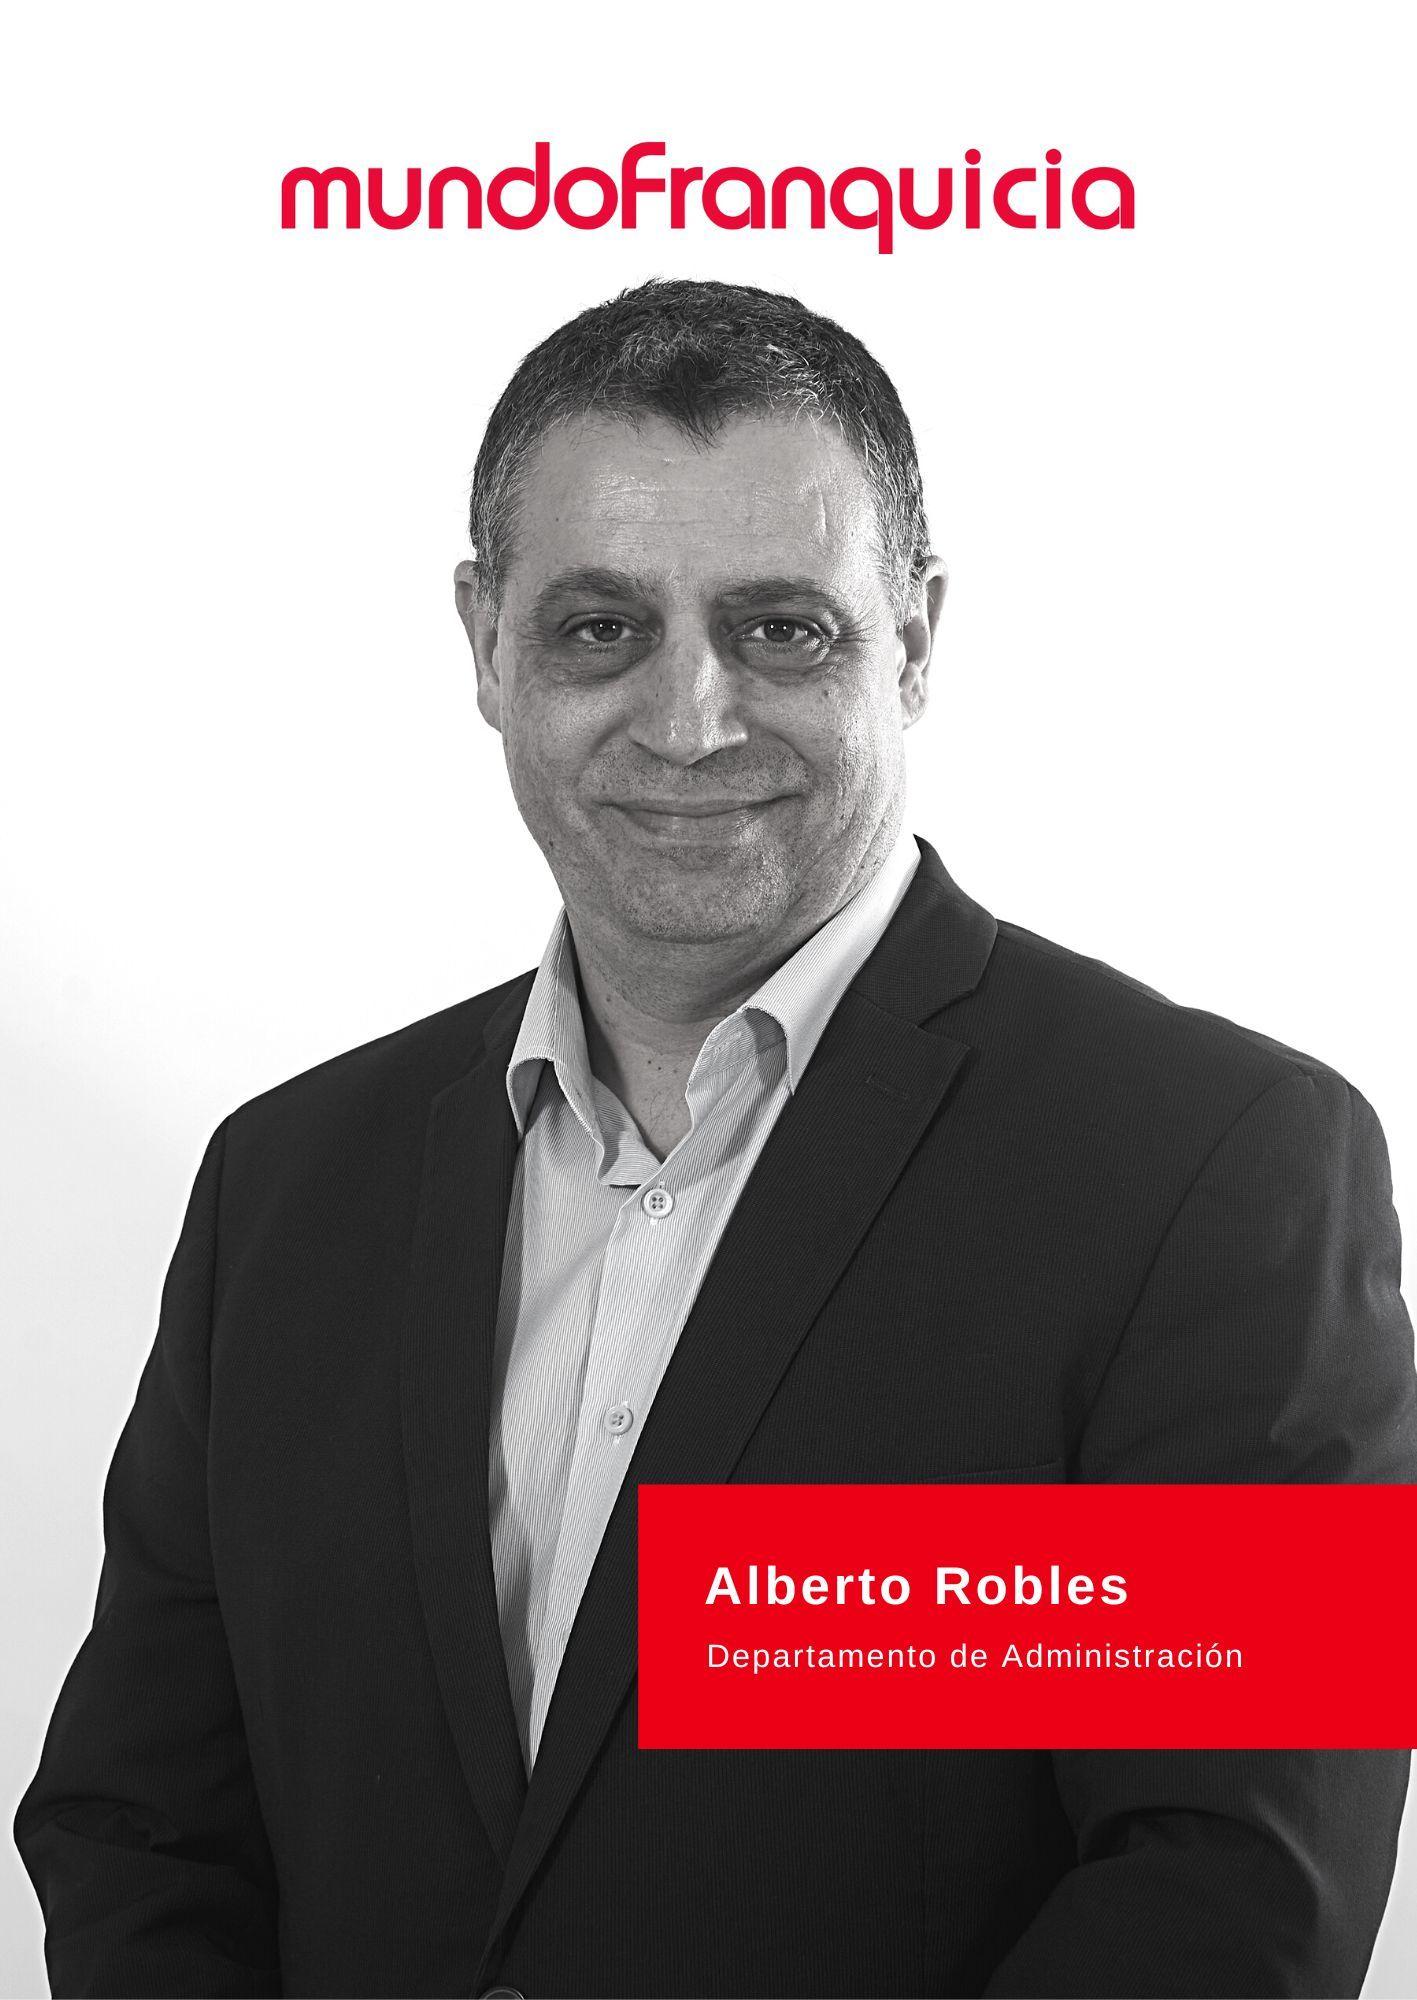 Jesús Alberto Robles